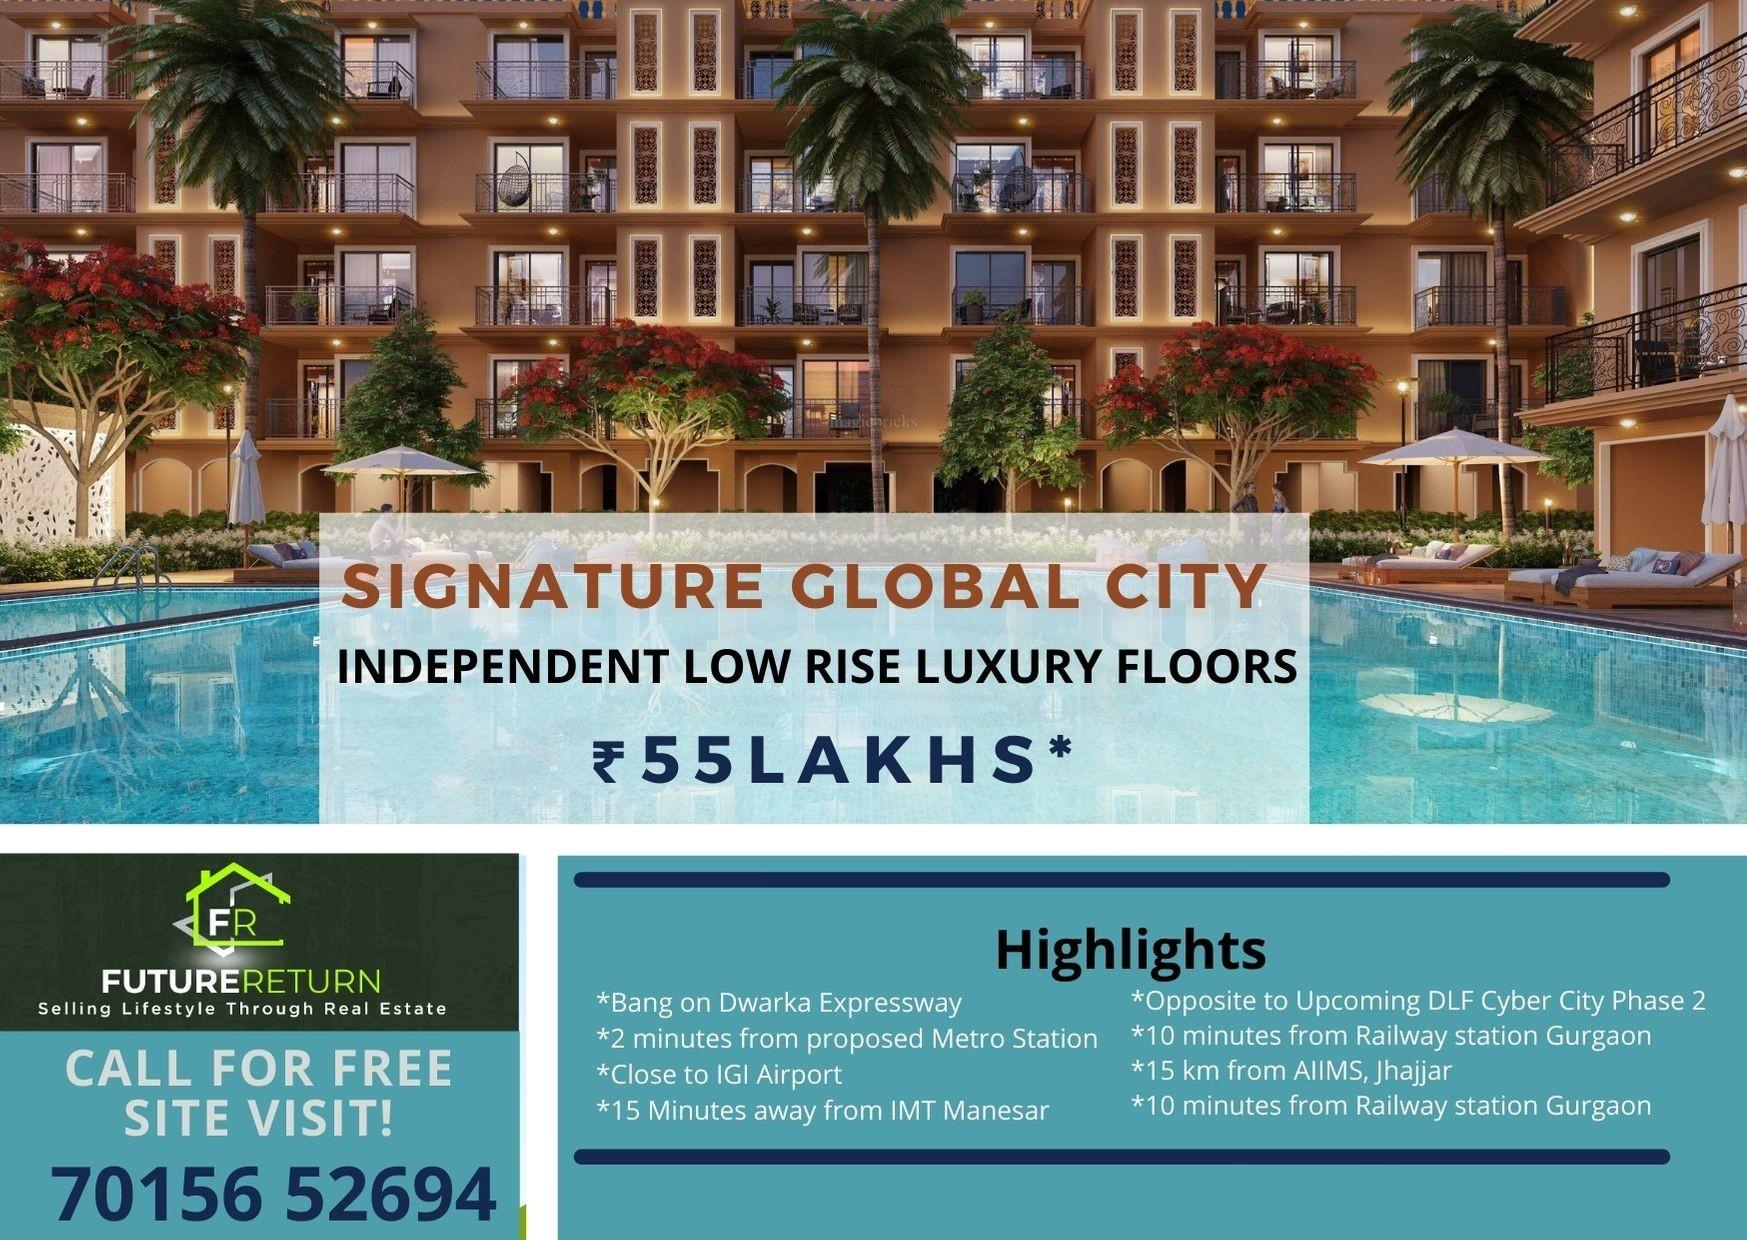 Signature Global City